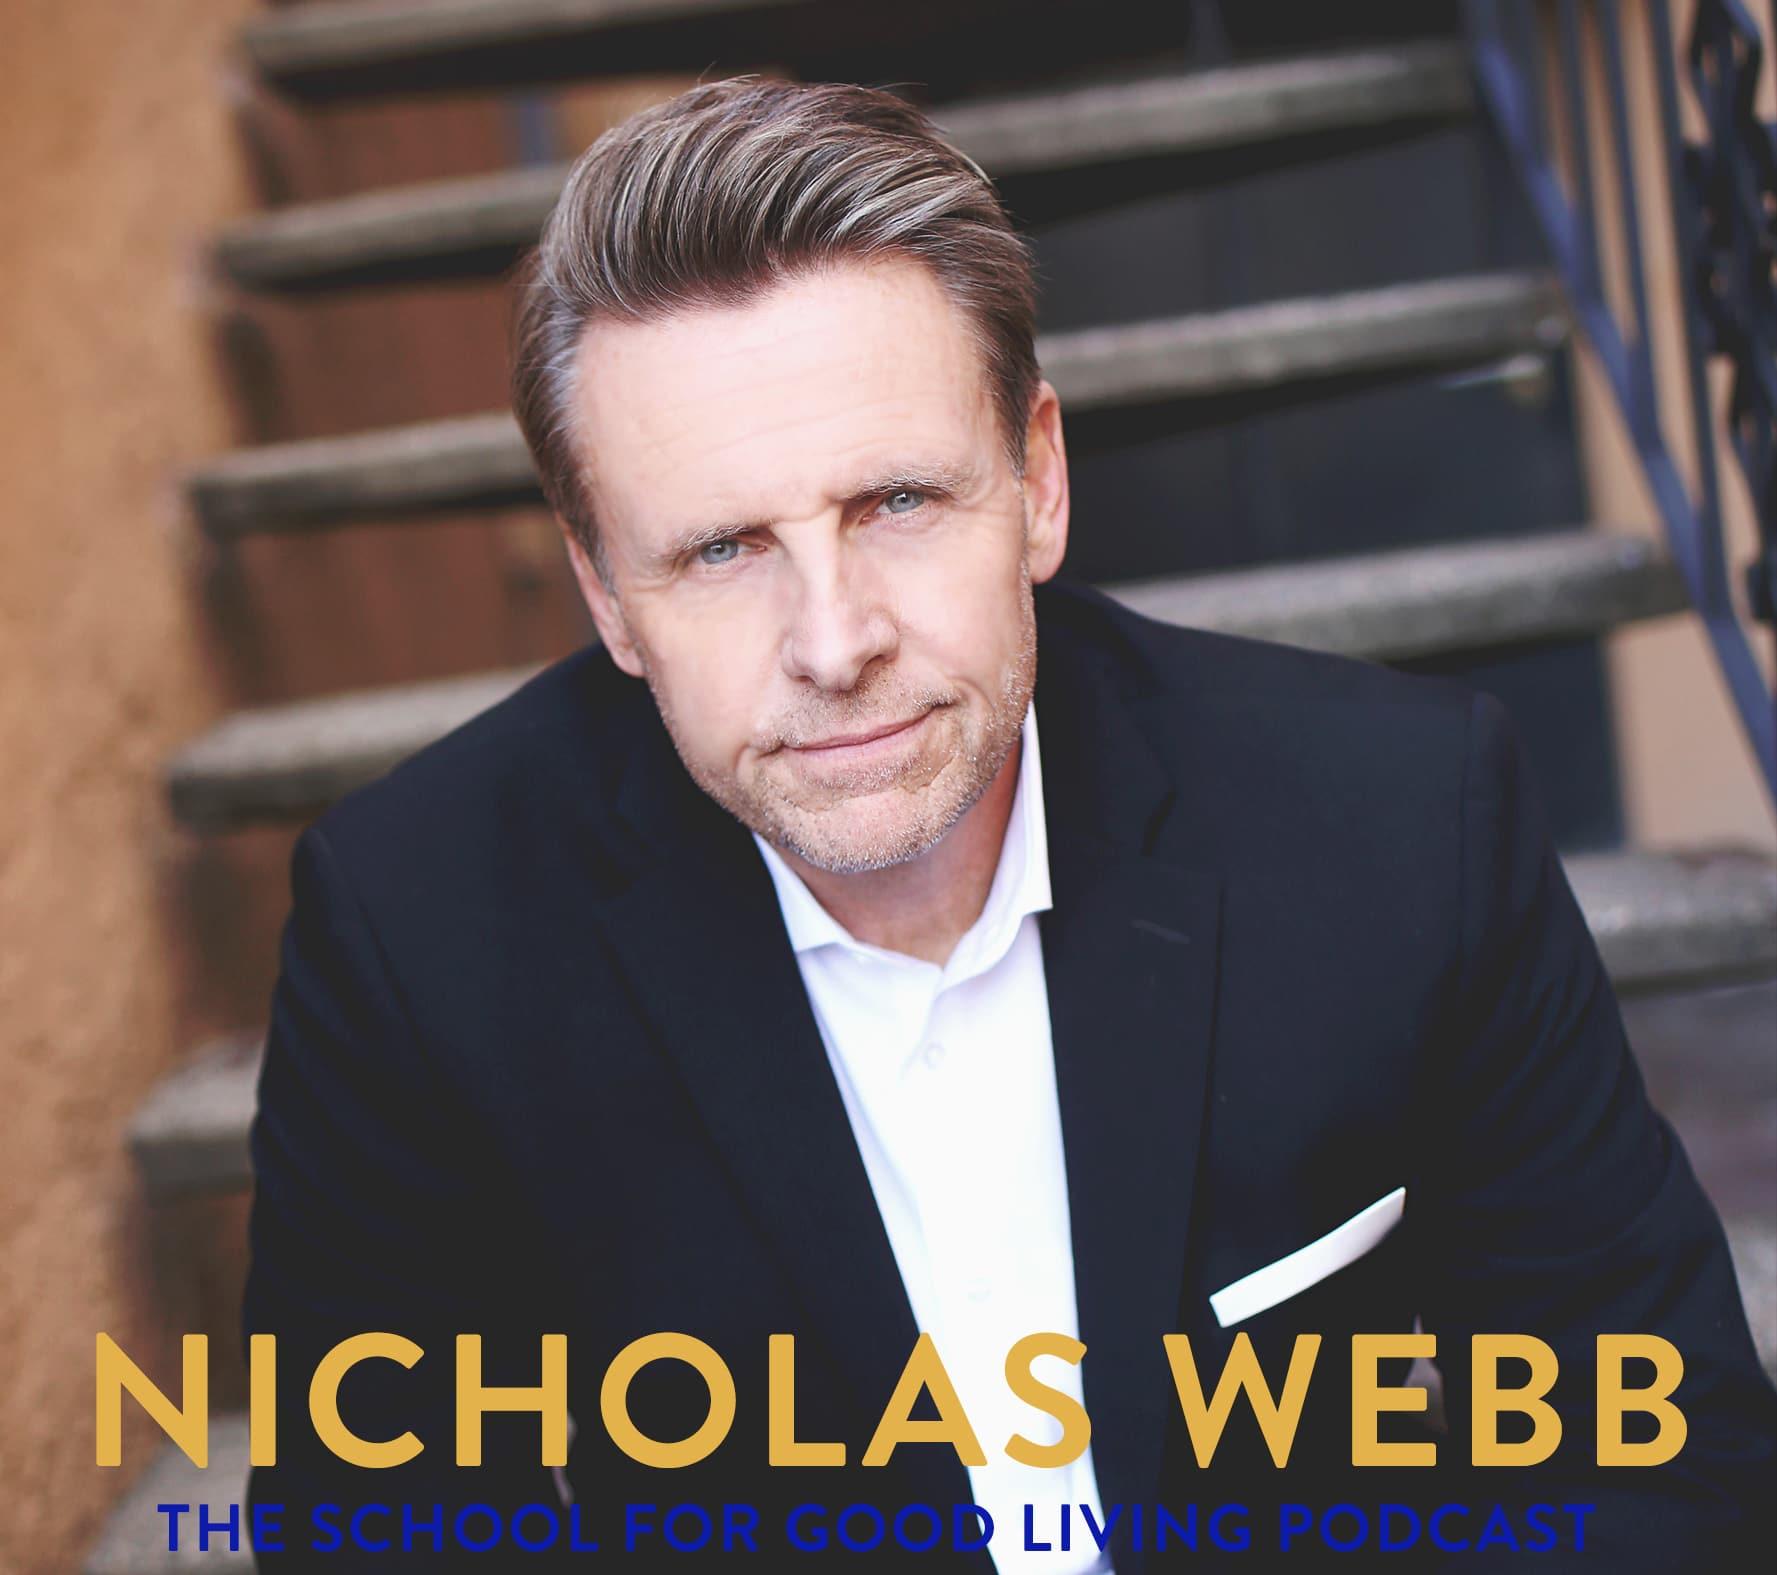 099 NicholasWebb Insta Art